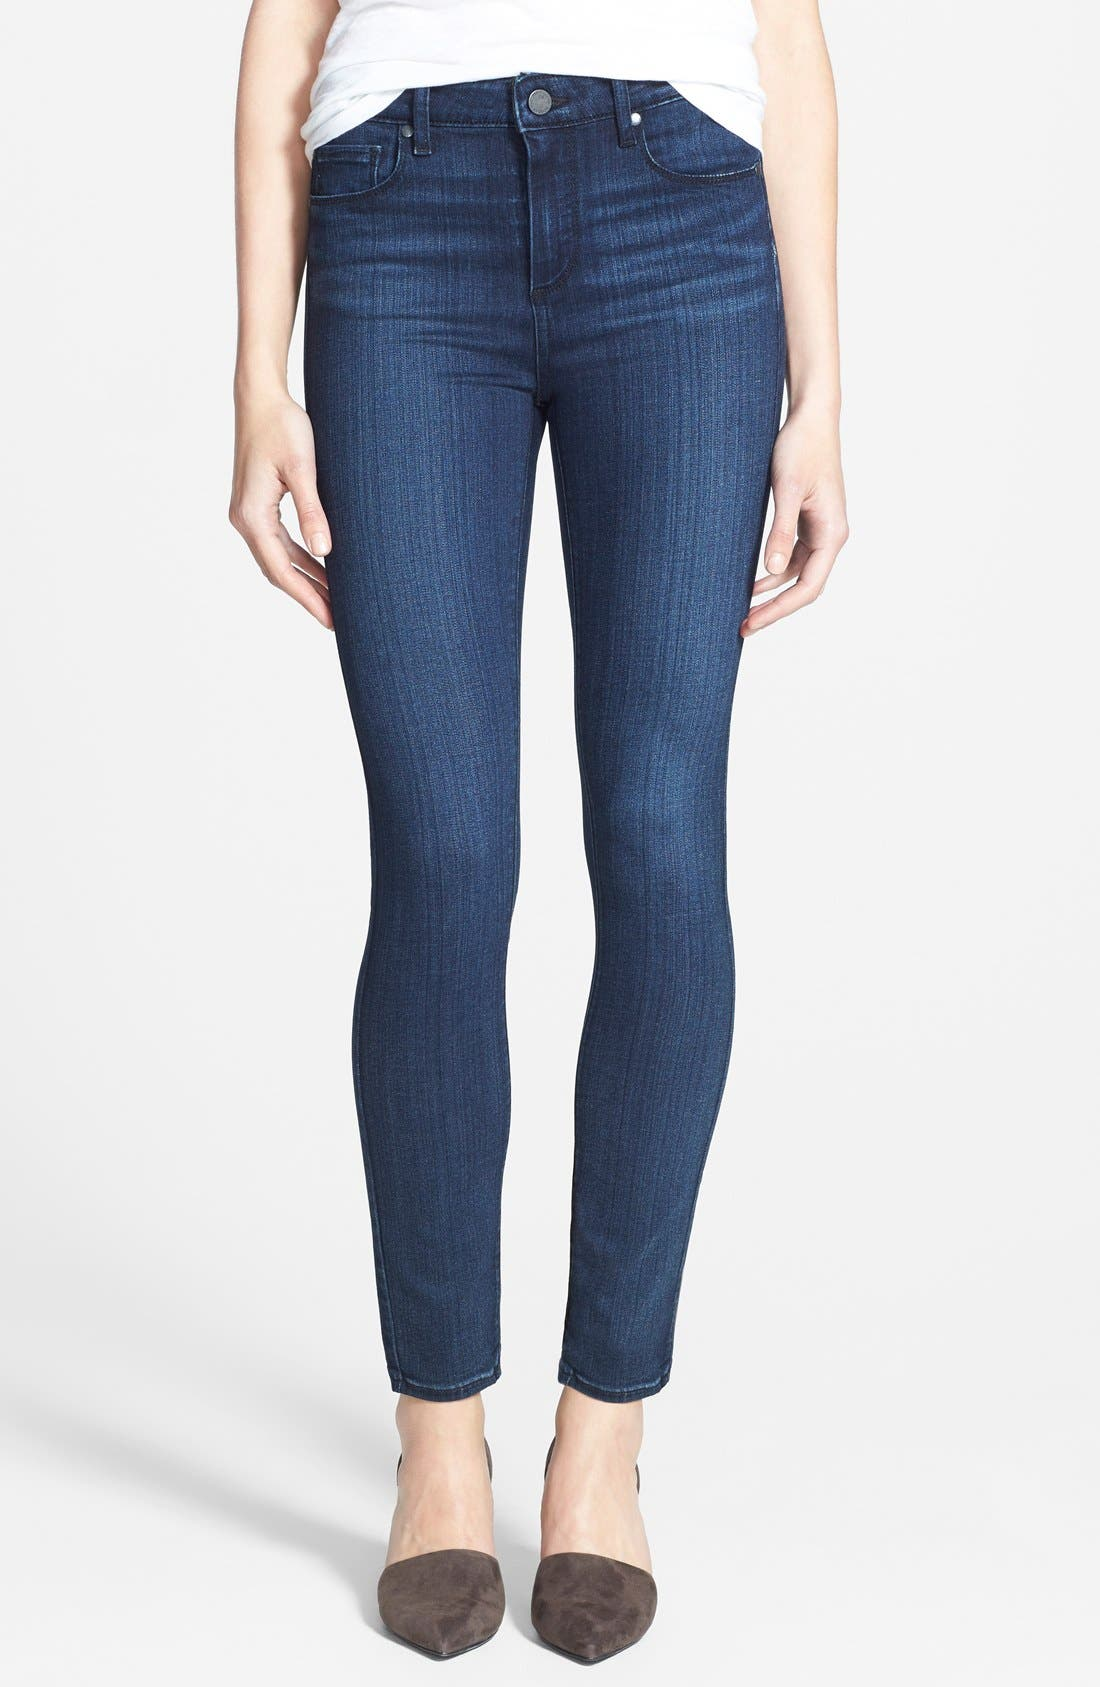 Alternate Image 1 Selected - Paige Denim 'Transcend - Hoxton' High Rise Ankle Jeans (Valor)